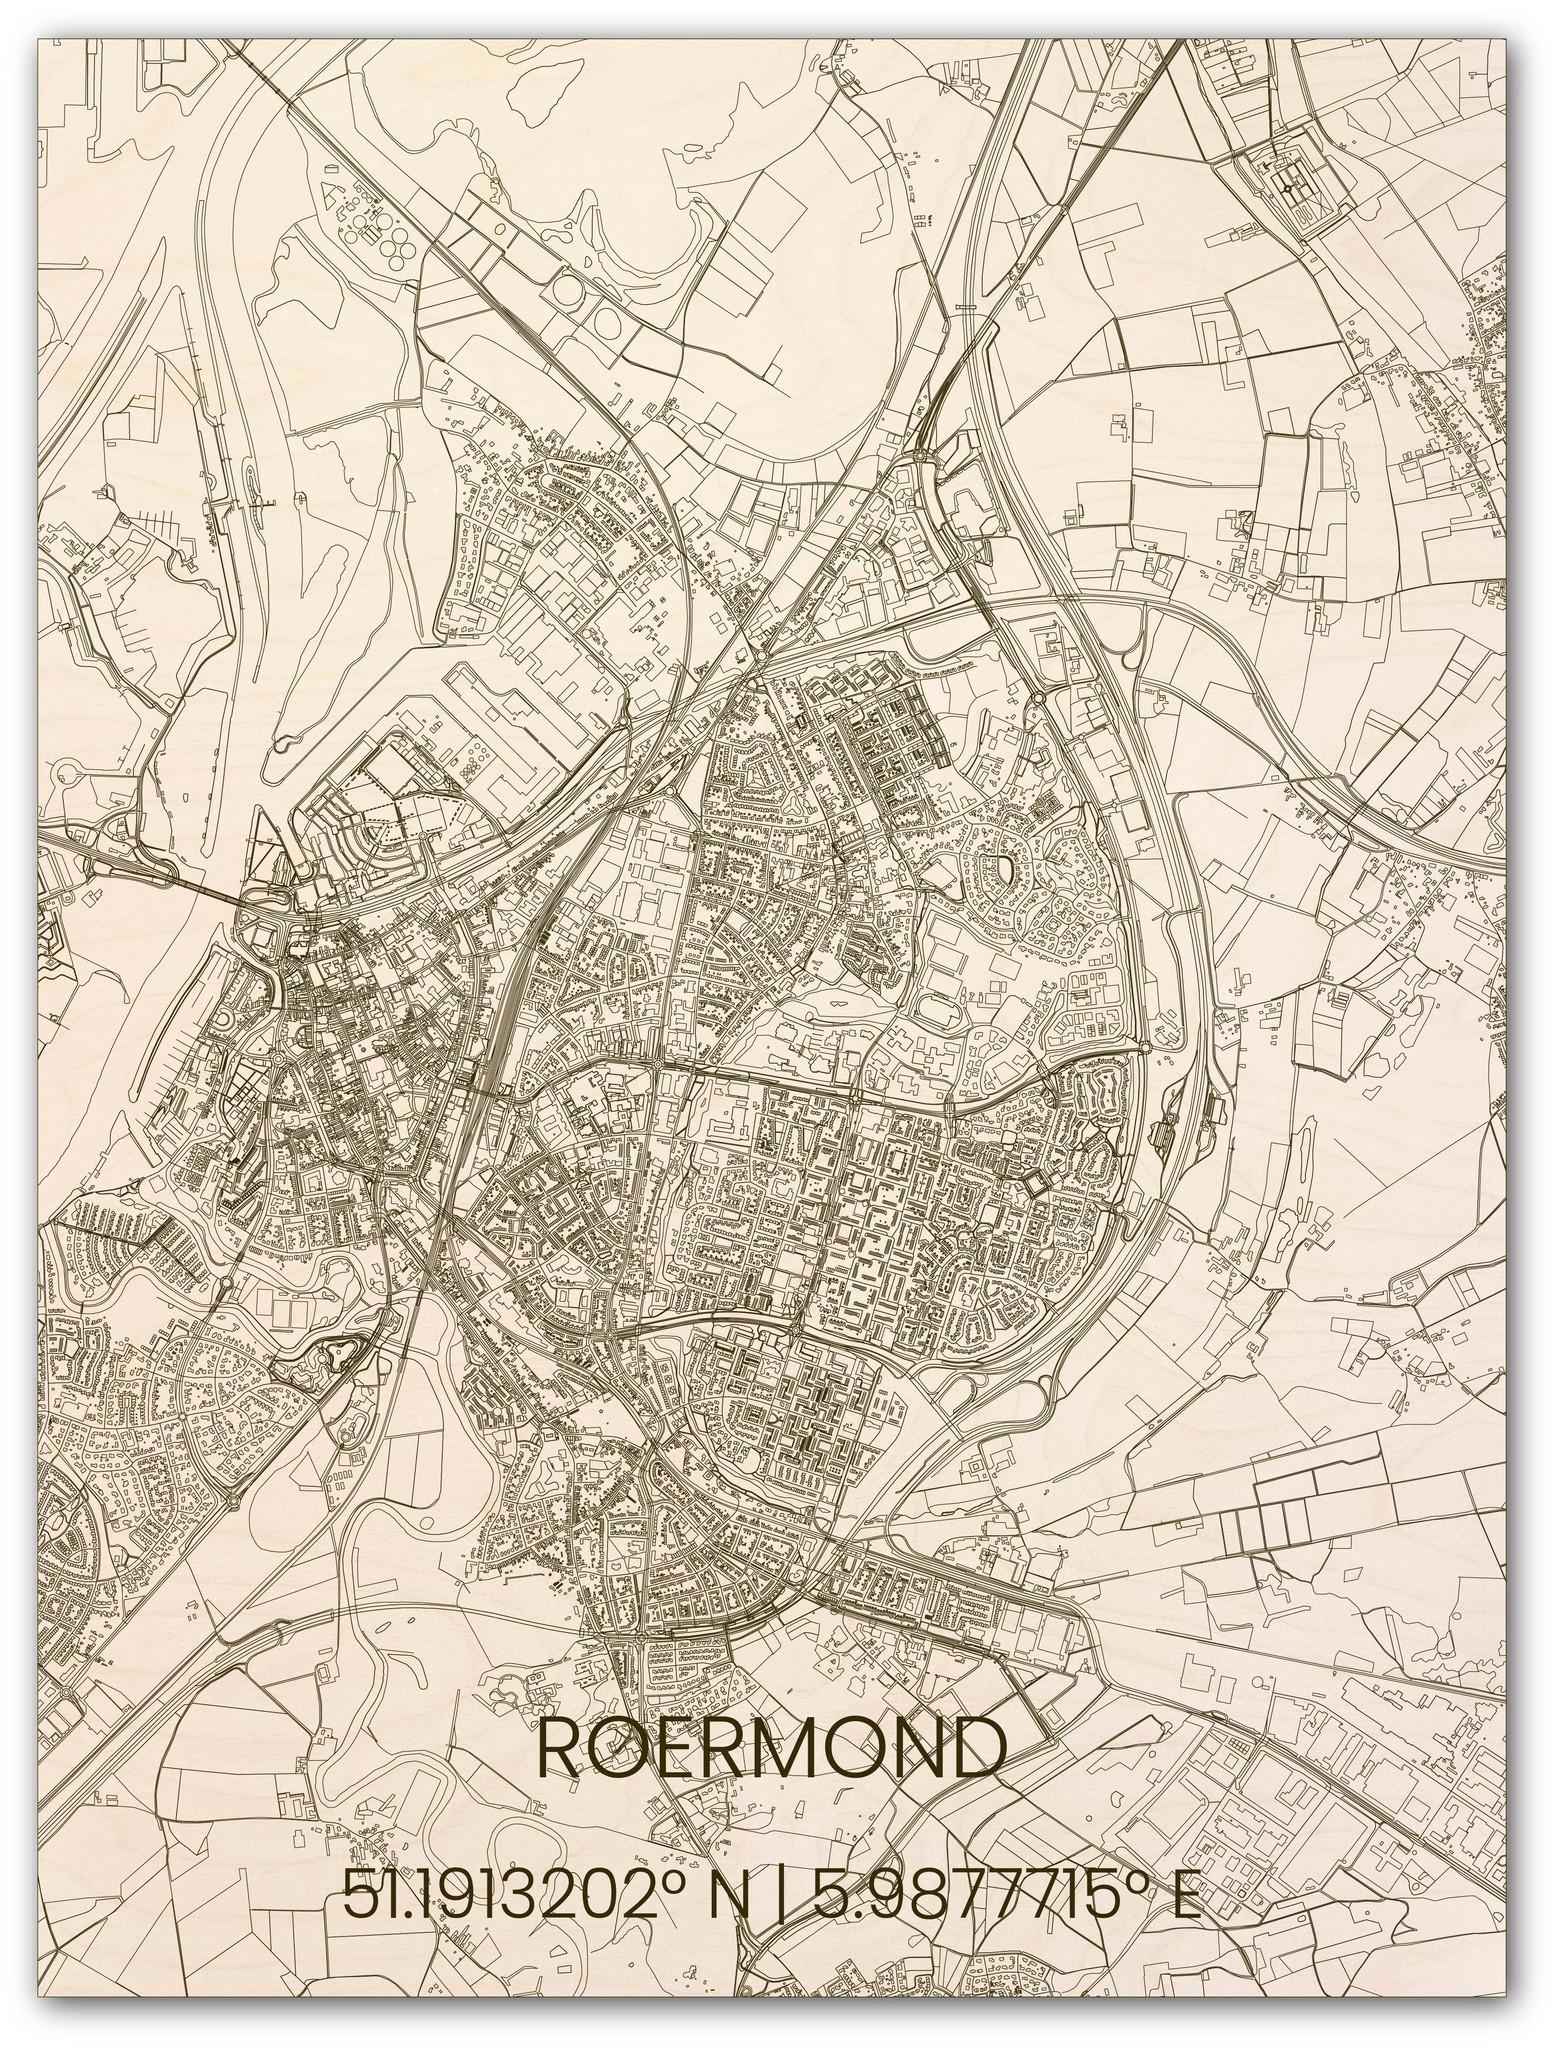 Houten stadsplattegrond Roermond-1